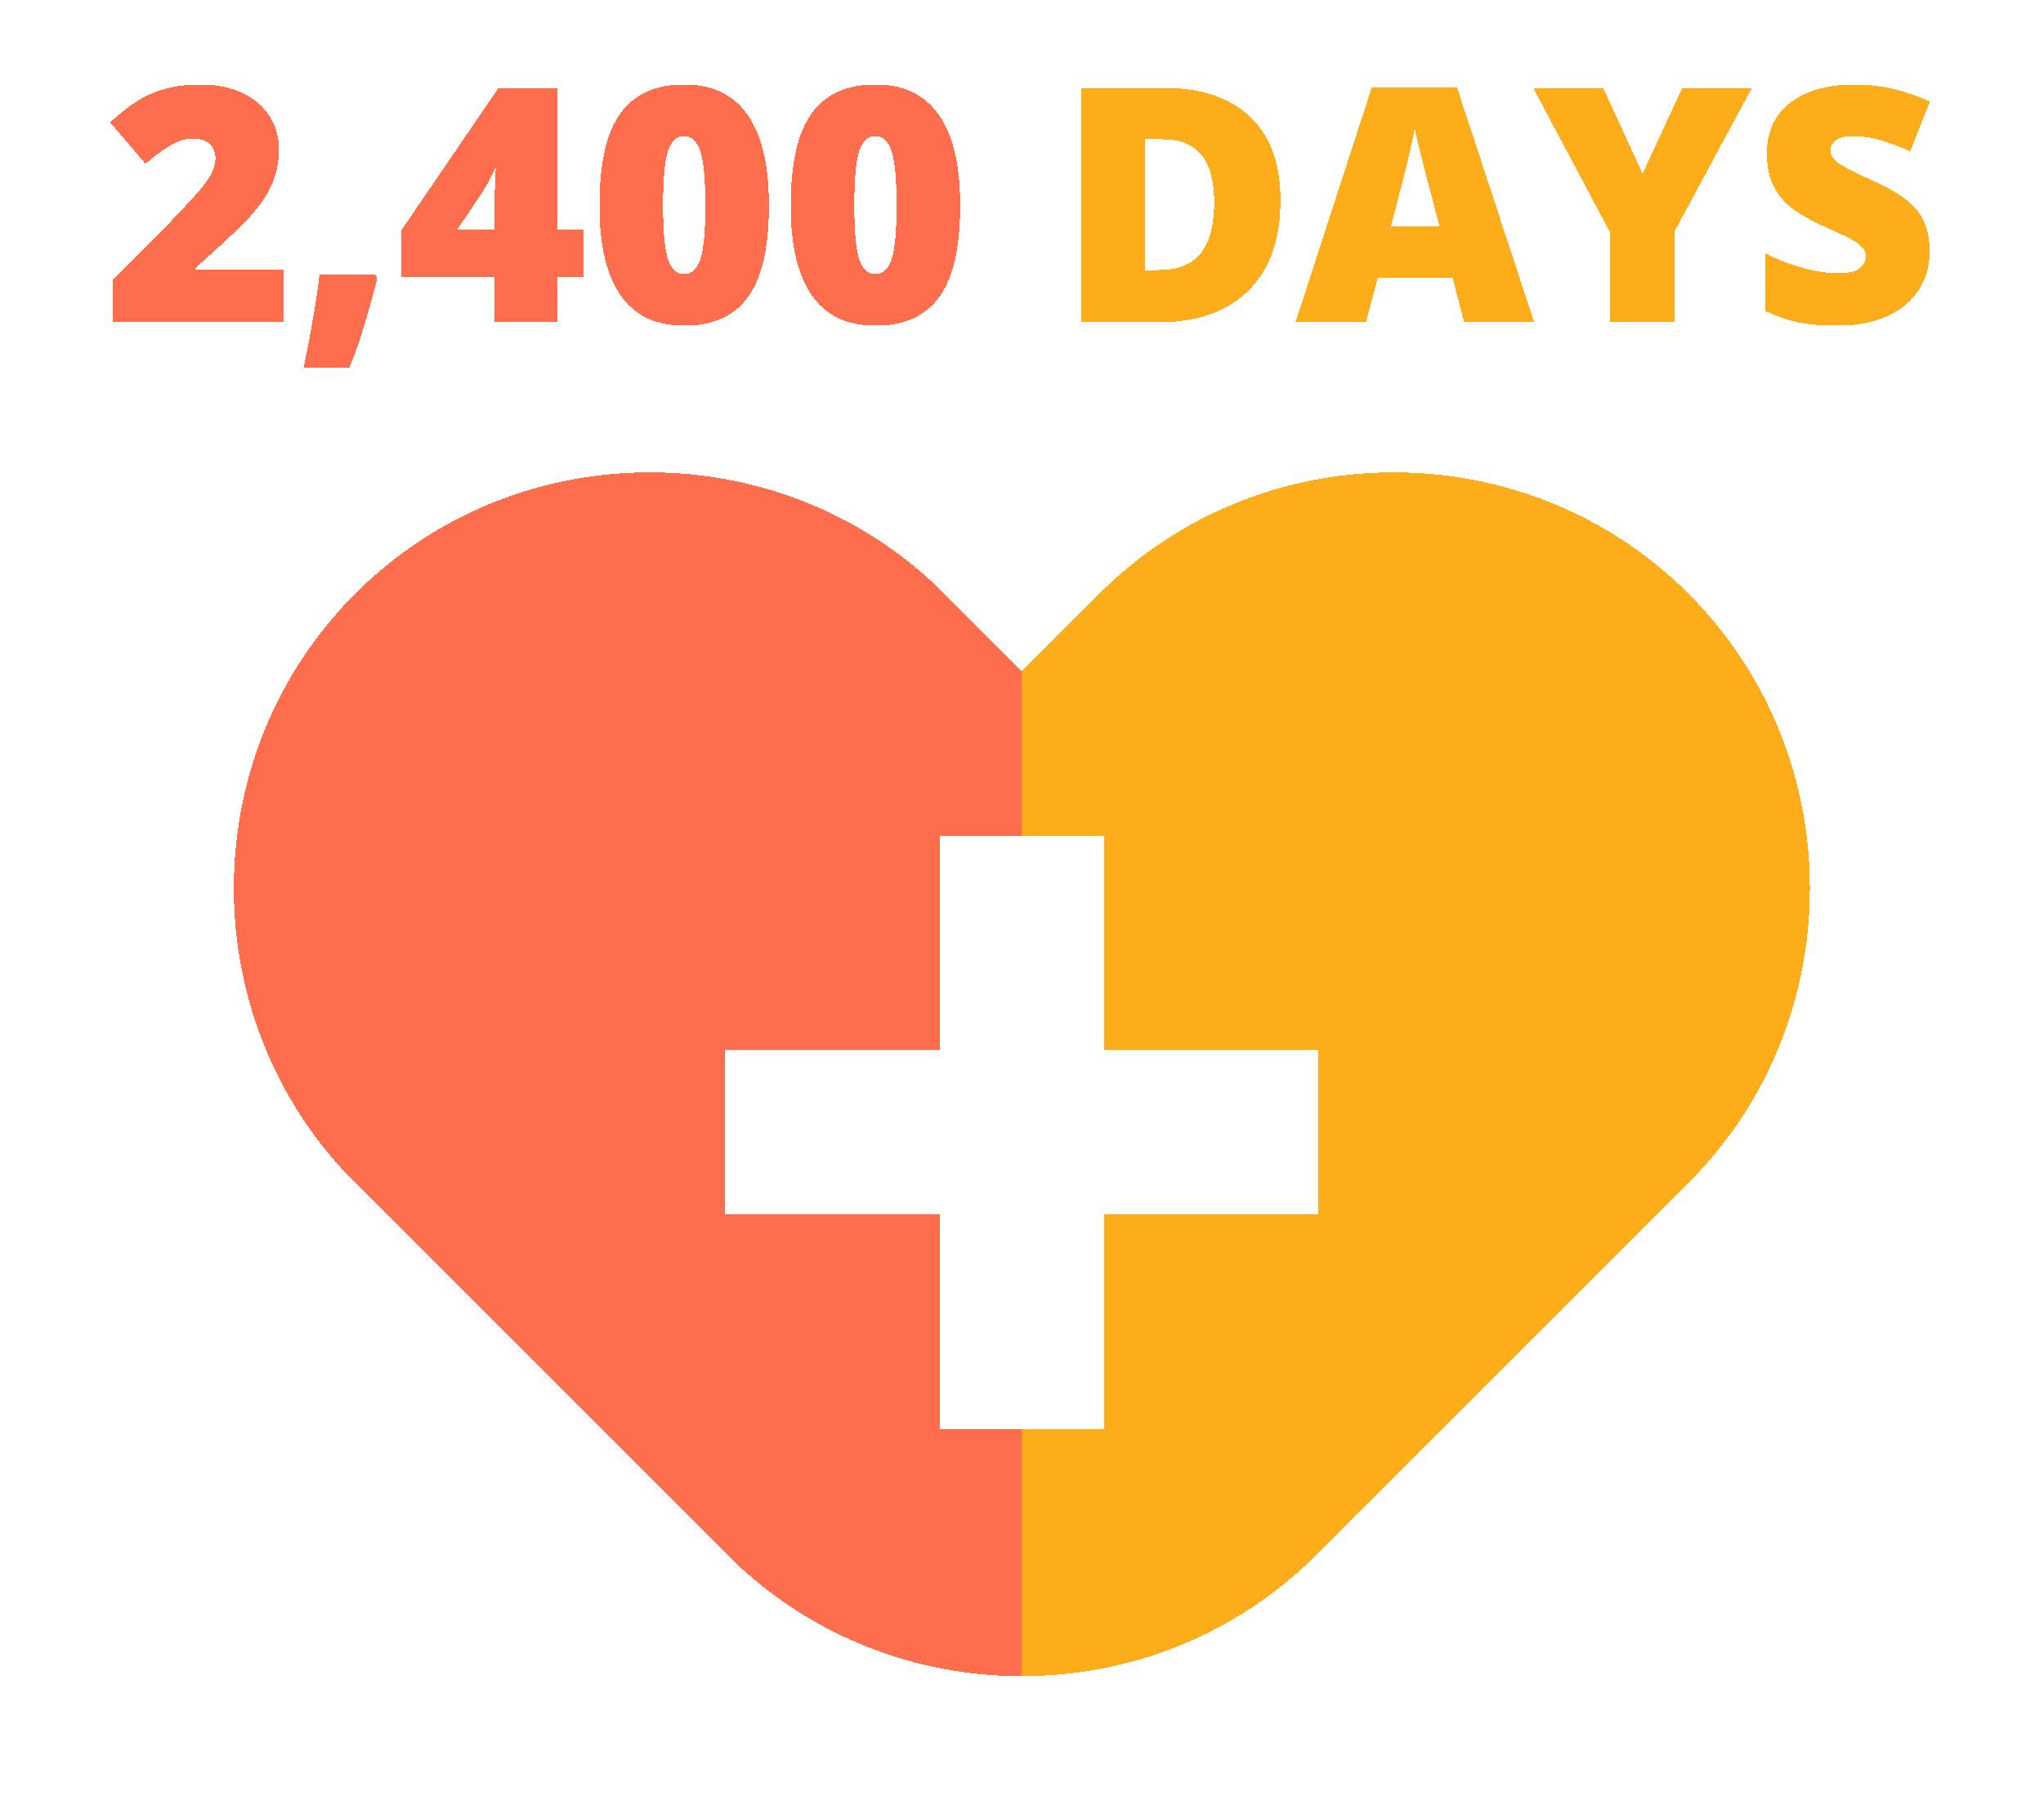 Infographic - 2400 Days